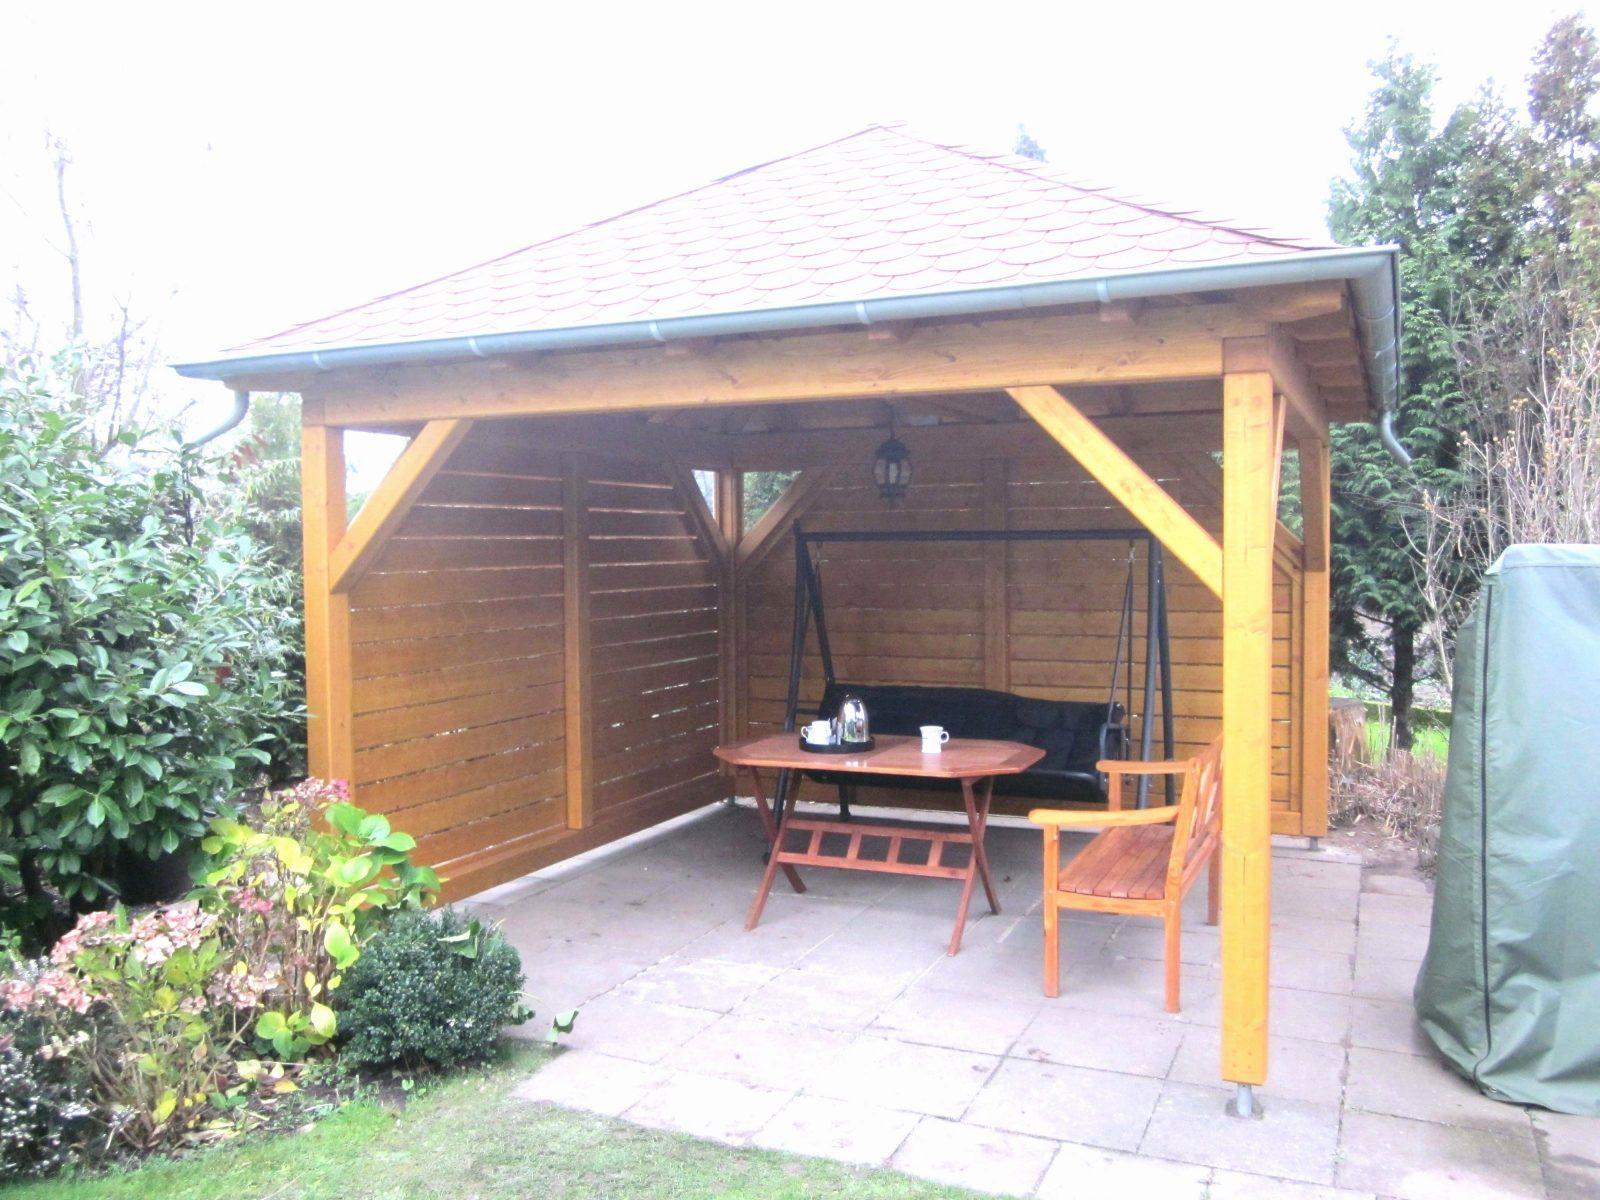 Holz Pavillon 3X4 Selber Bauen Für Ideen Pavillon 3X4 Holz von Holz Pavillon 3X4 Selber Bauen Bild